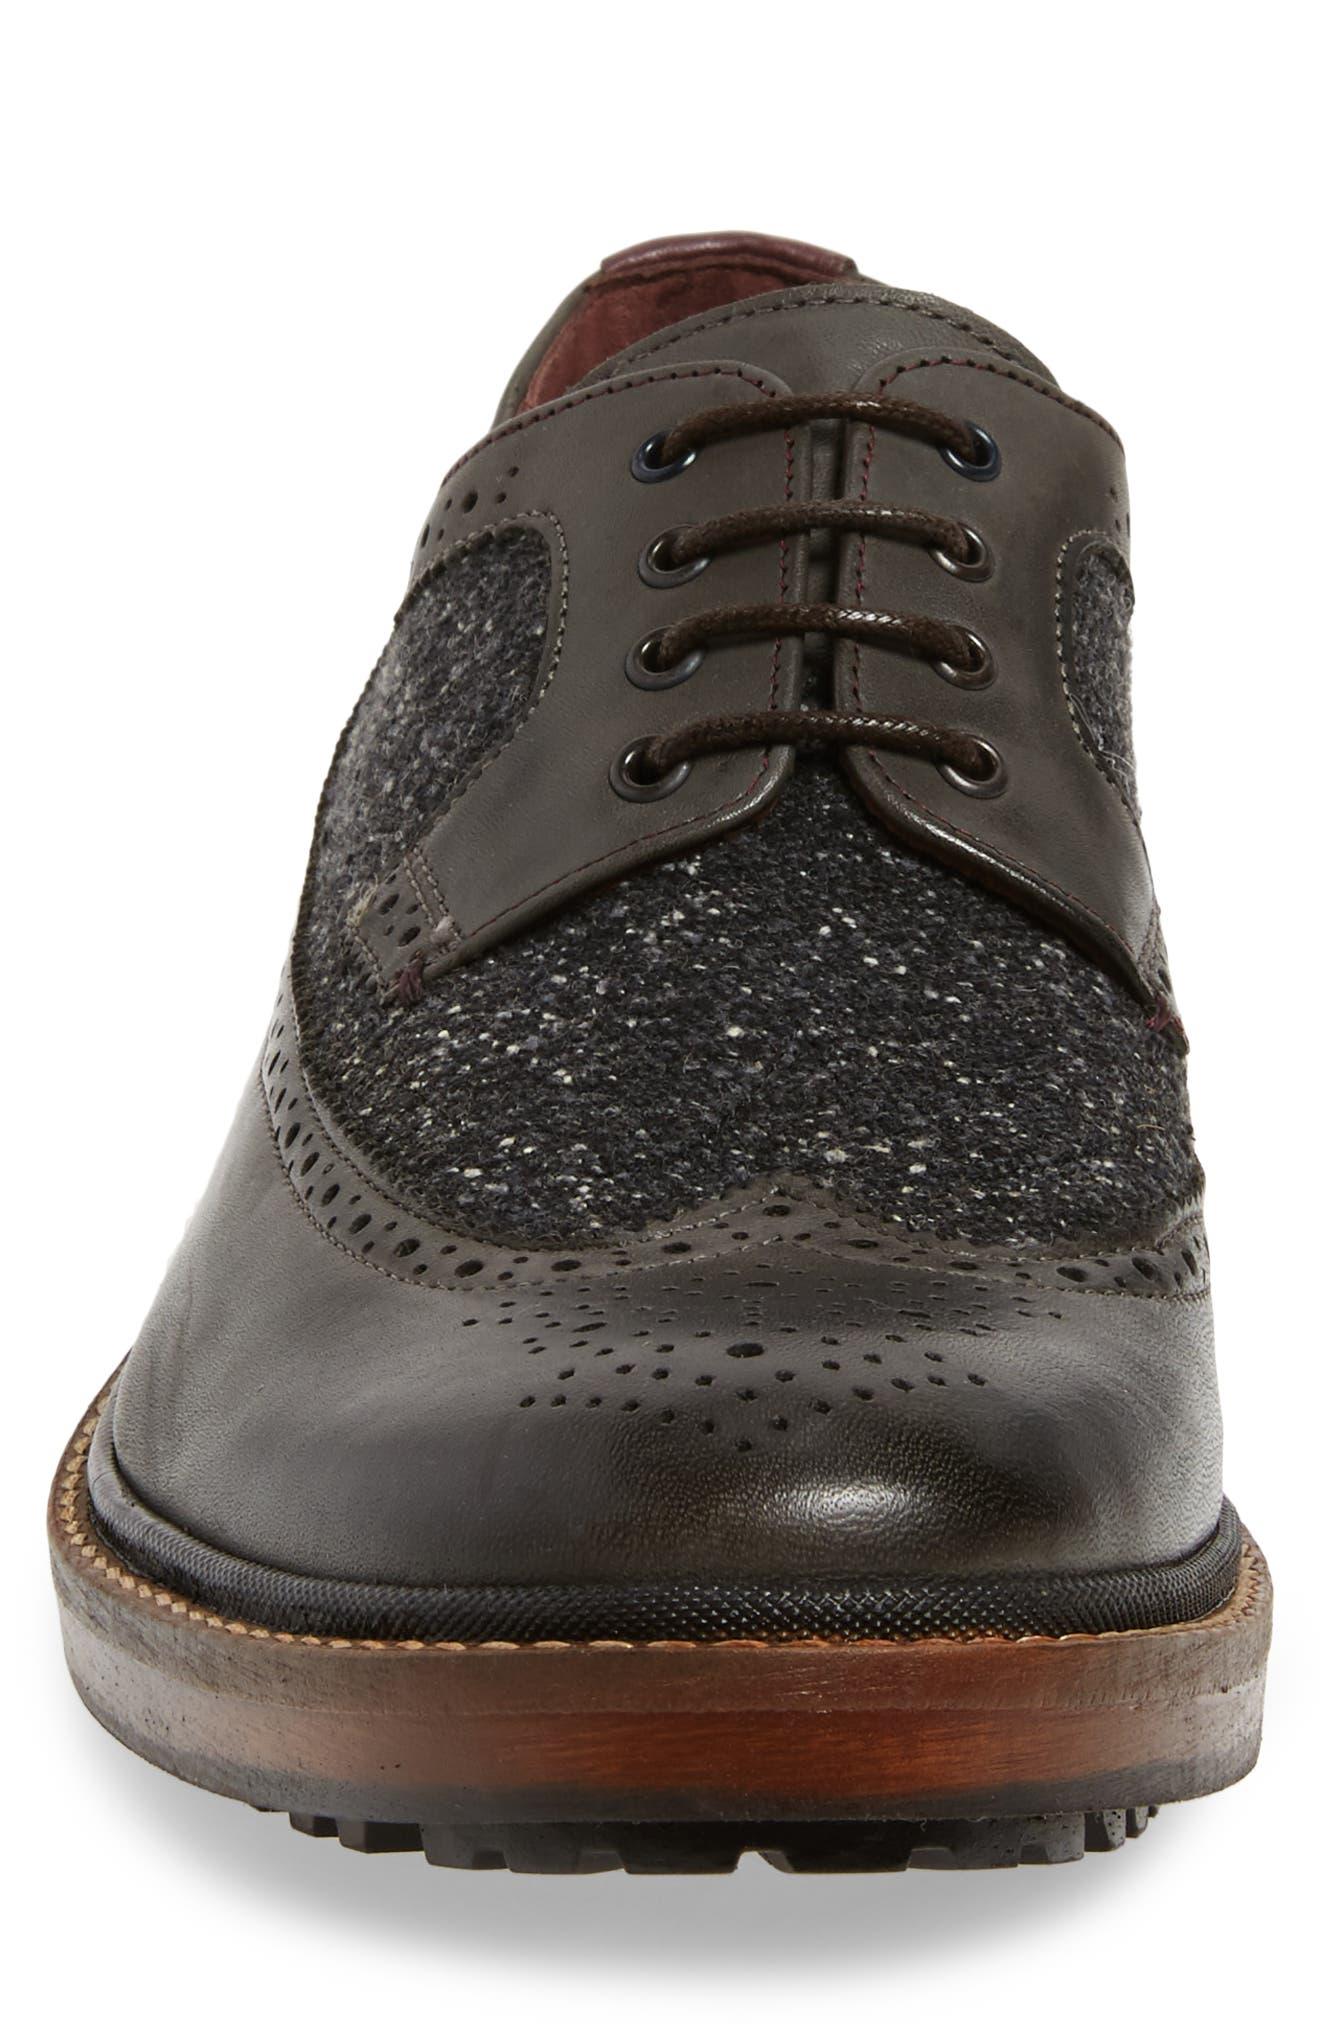 Casbo Spectator Shoe,                             Alternate thumbnail 7, color,